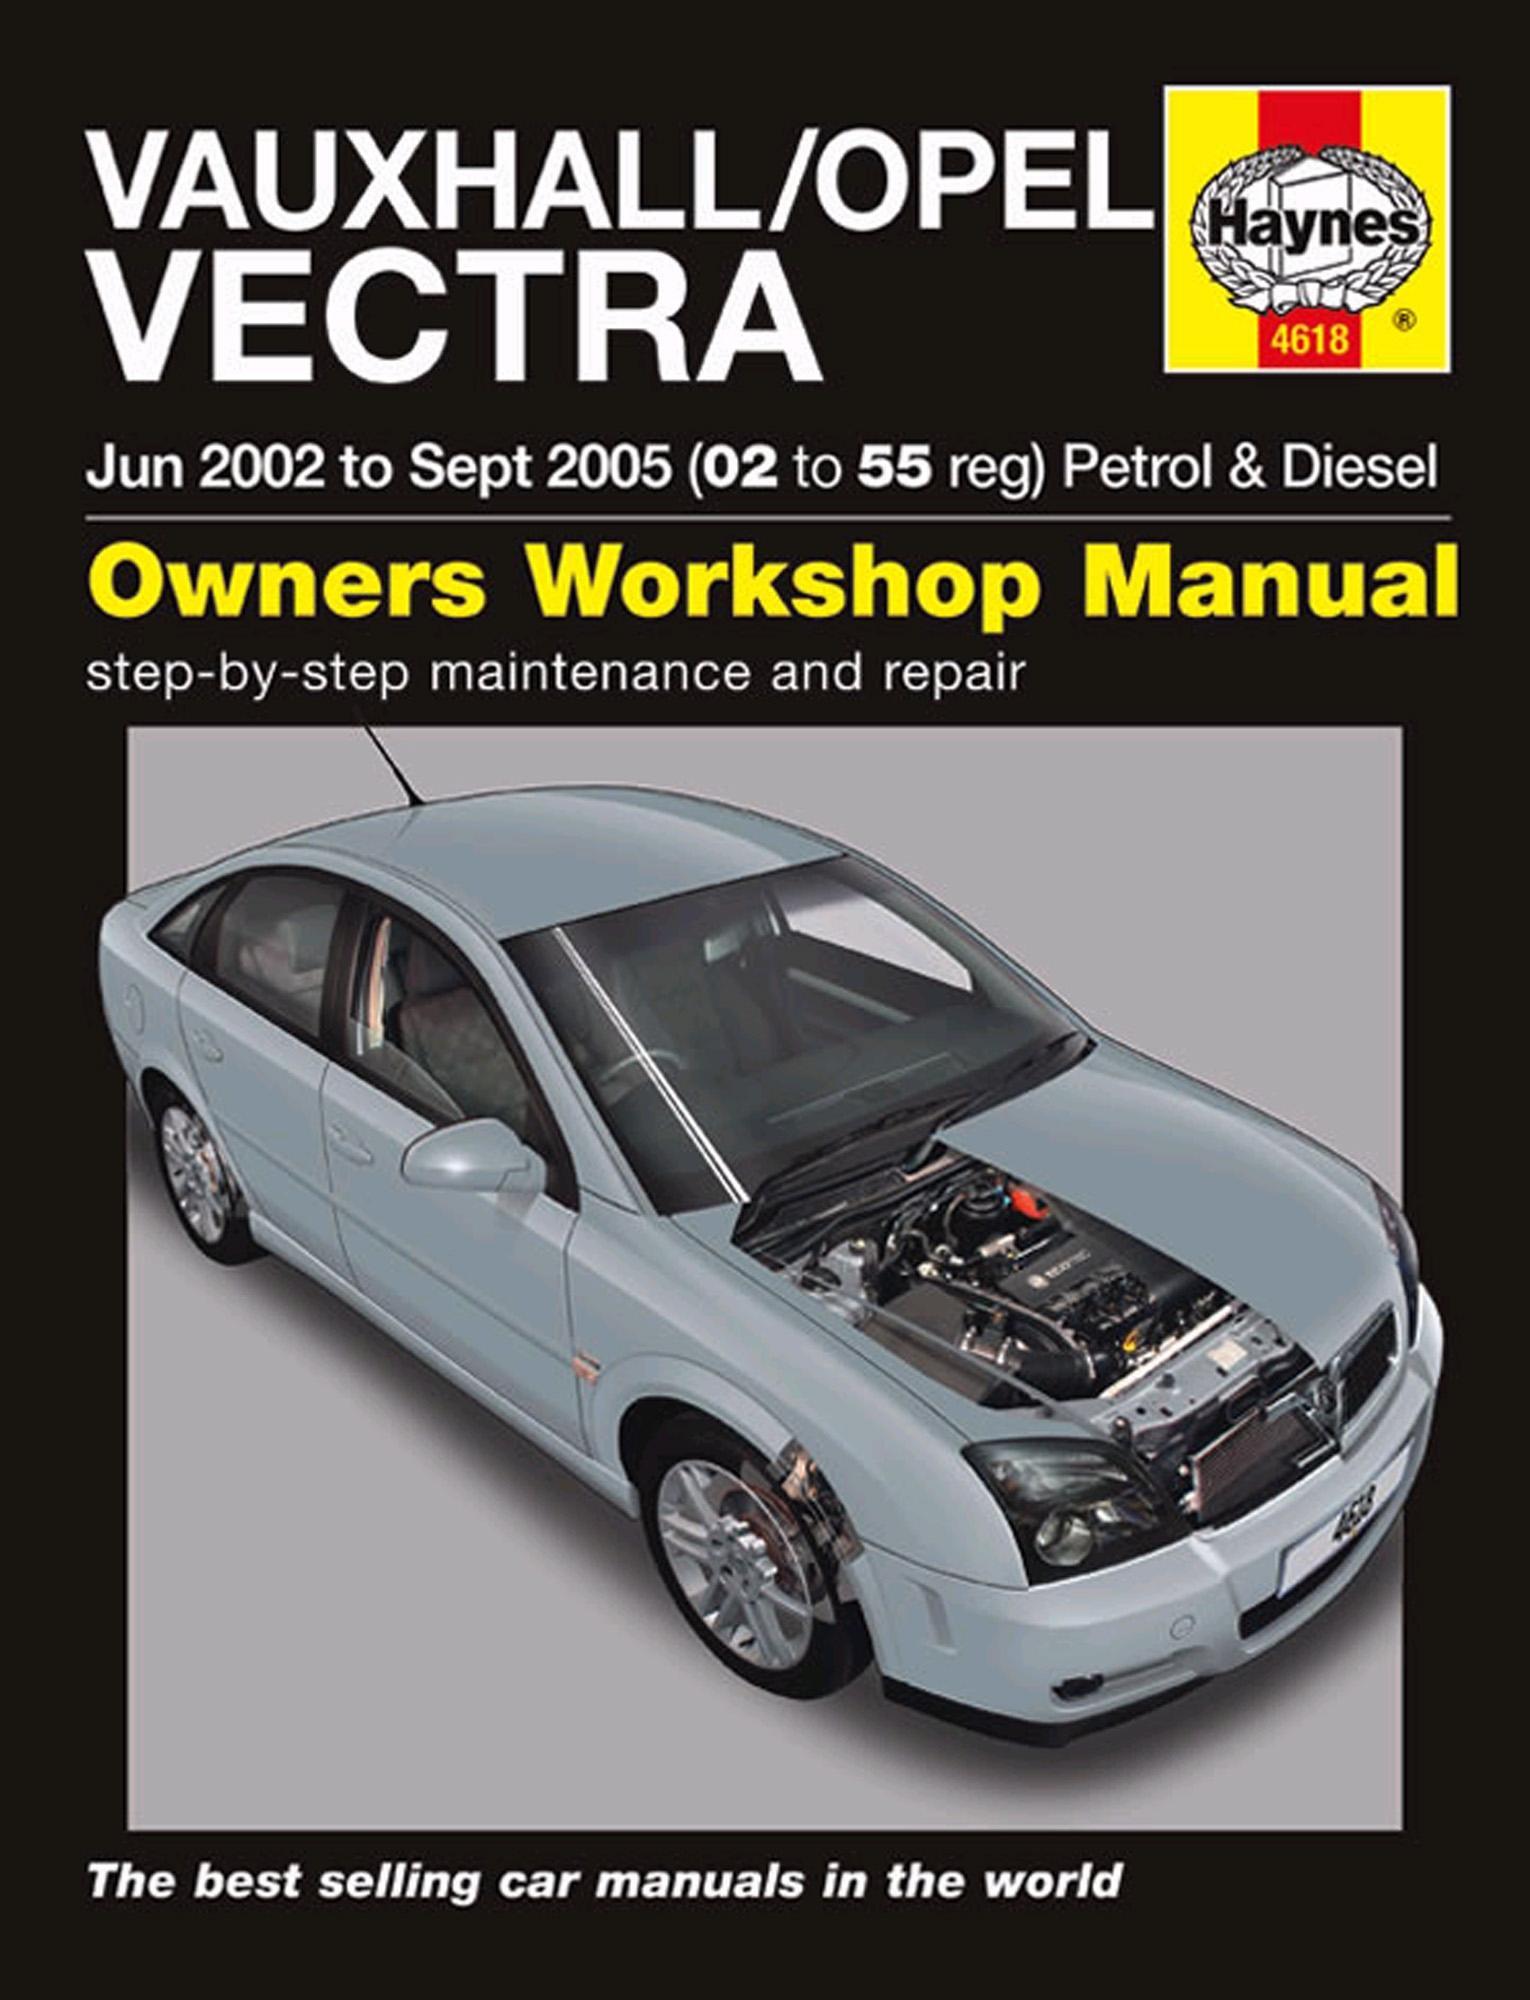 haynes vauxhall vectra june 02 to rh halfords com opel vectra b 1997 service manual opel vectra service manual free download